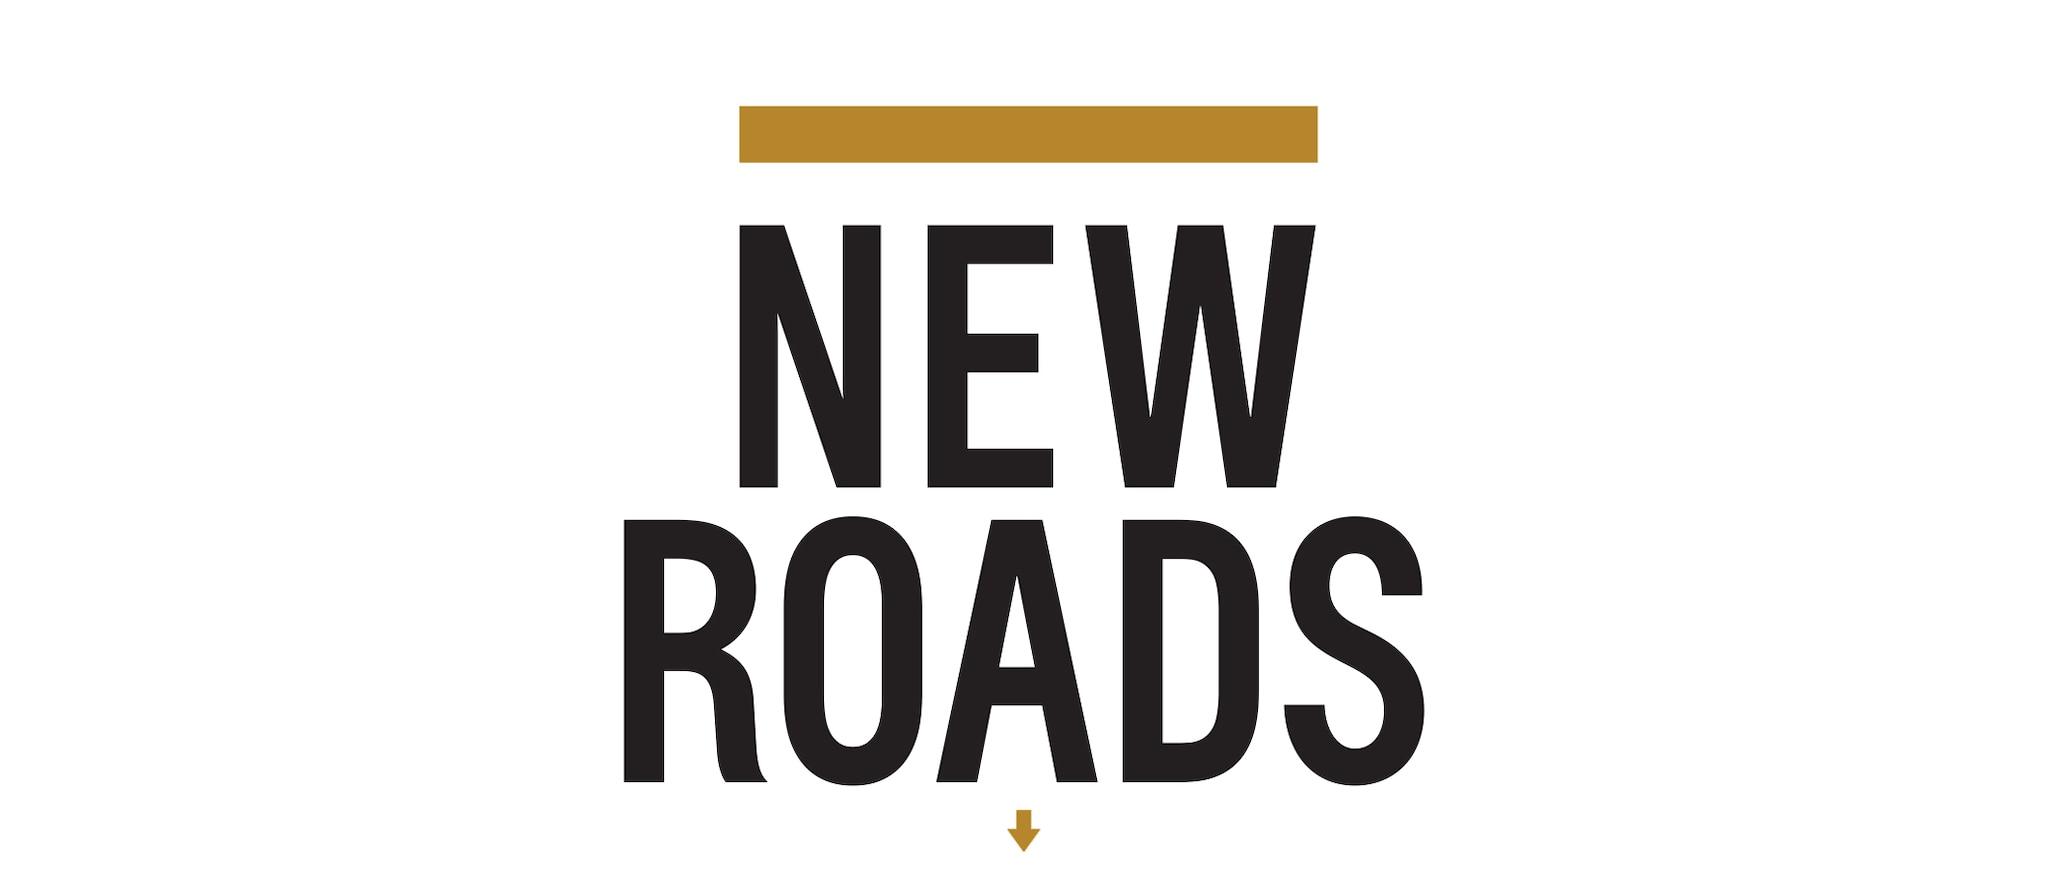 Revista New Roads de Chevrolet: Masthead